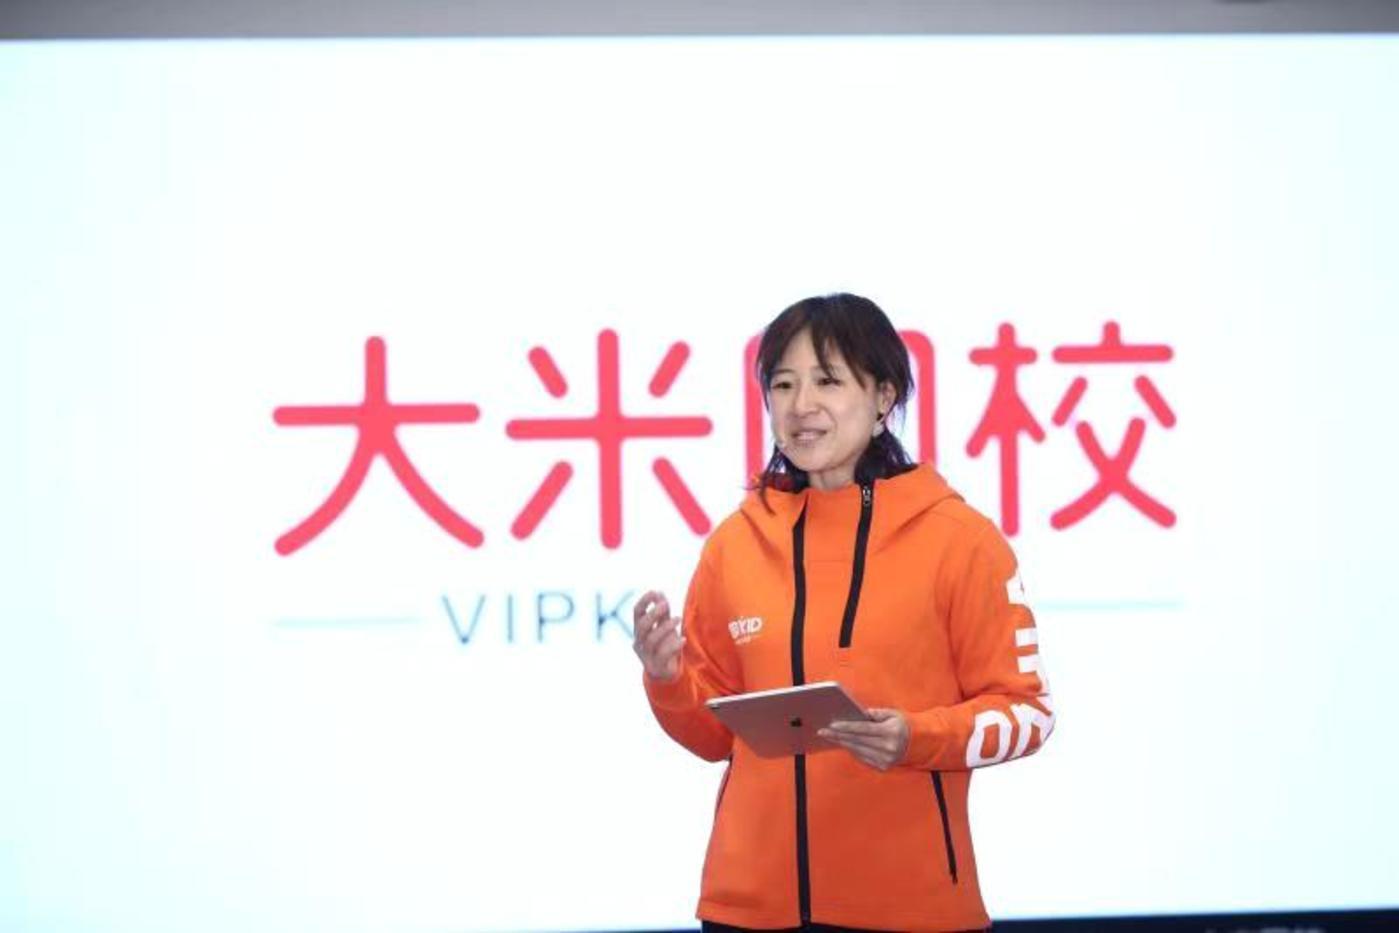 VIPKID创始人及CEO 米雯娟